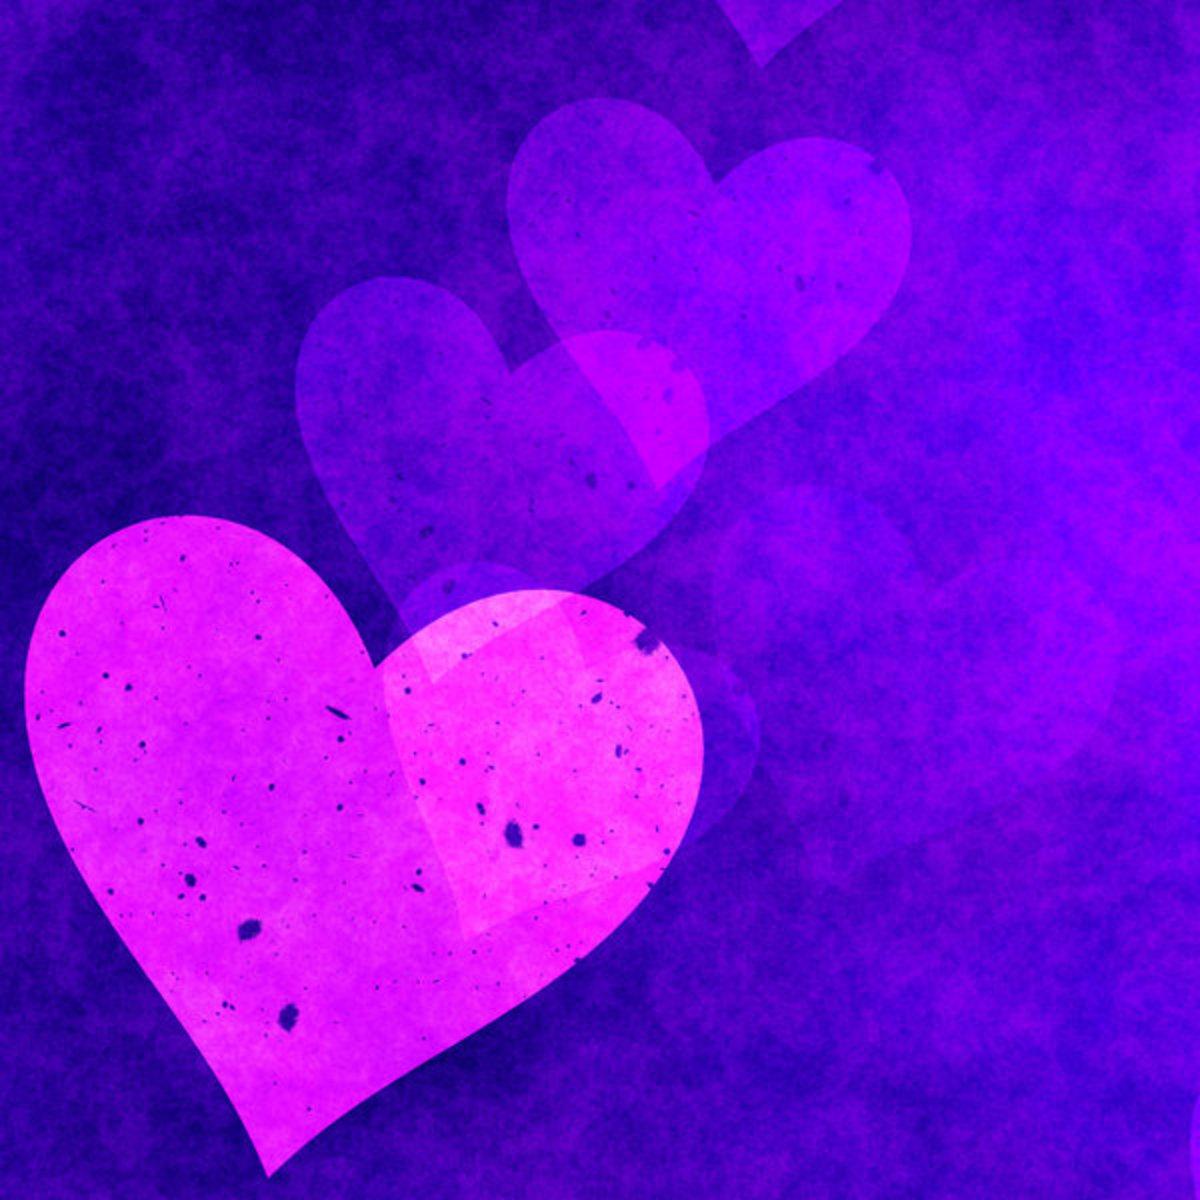 Three Hearts Picture